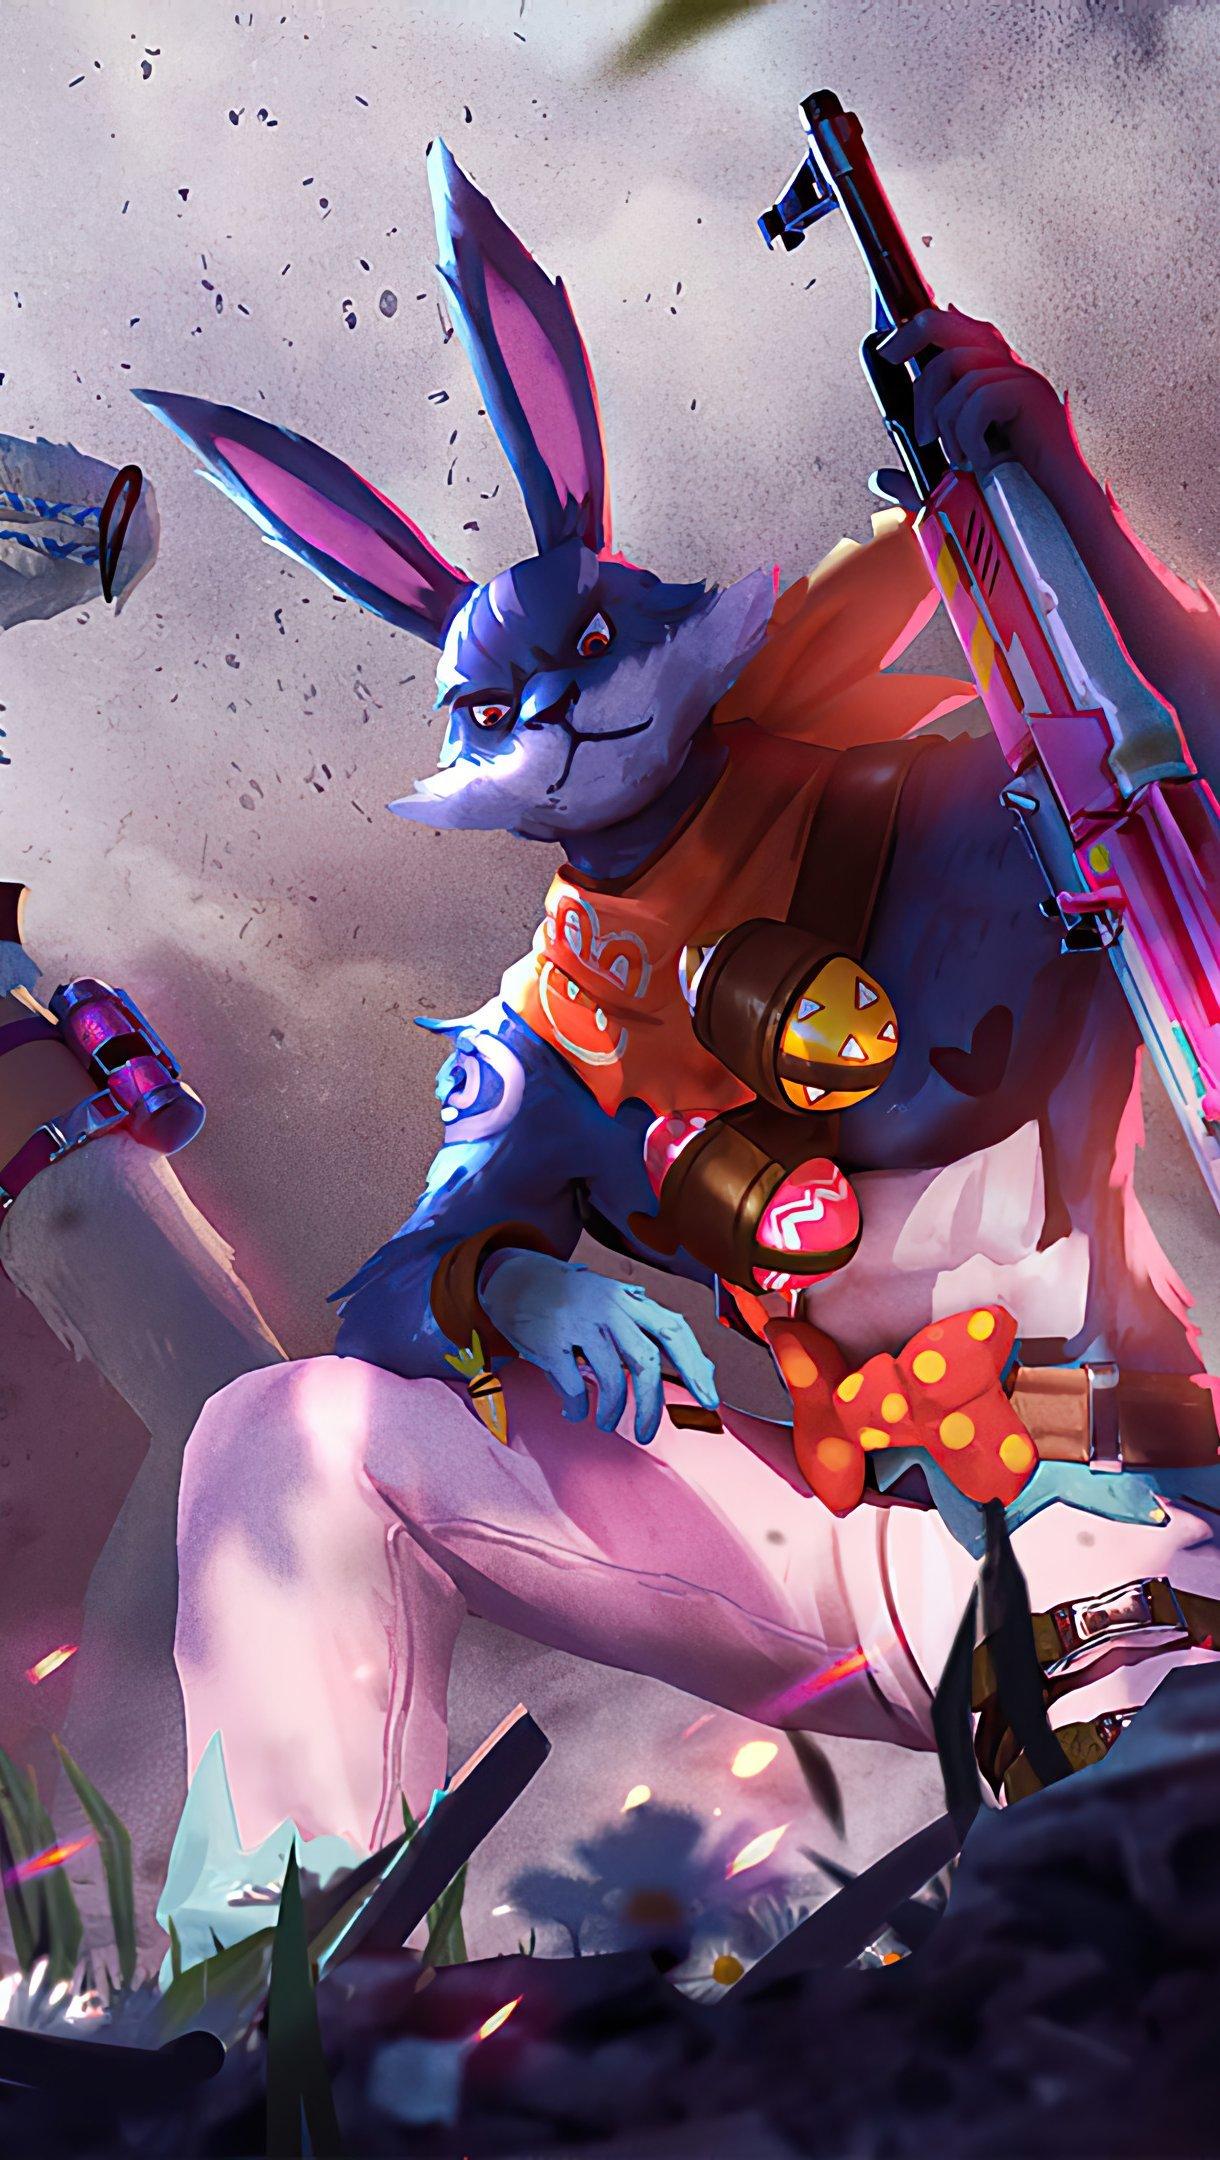 Wallpaper Garena Free Fire Bunny Warrior Vertical